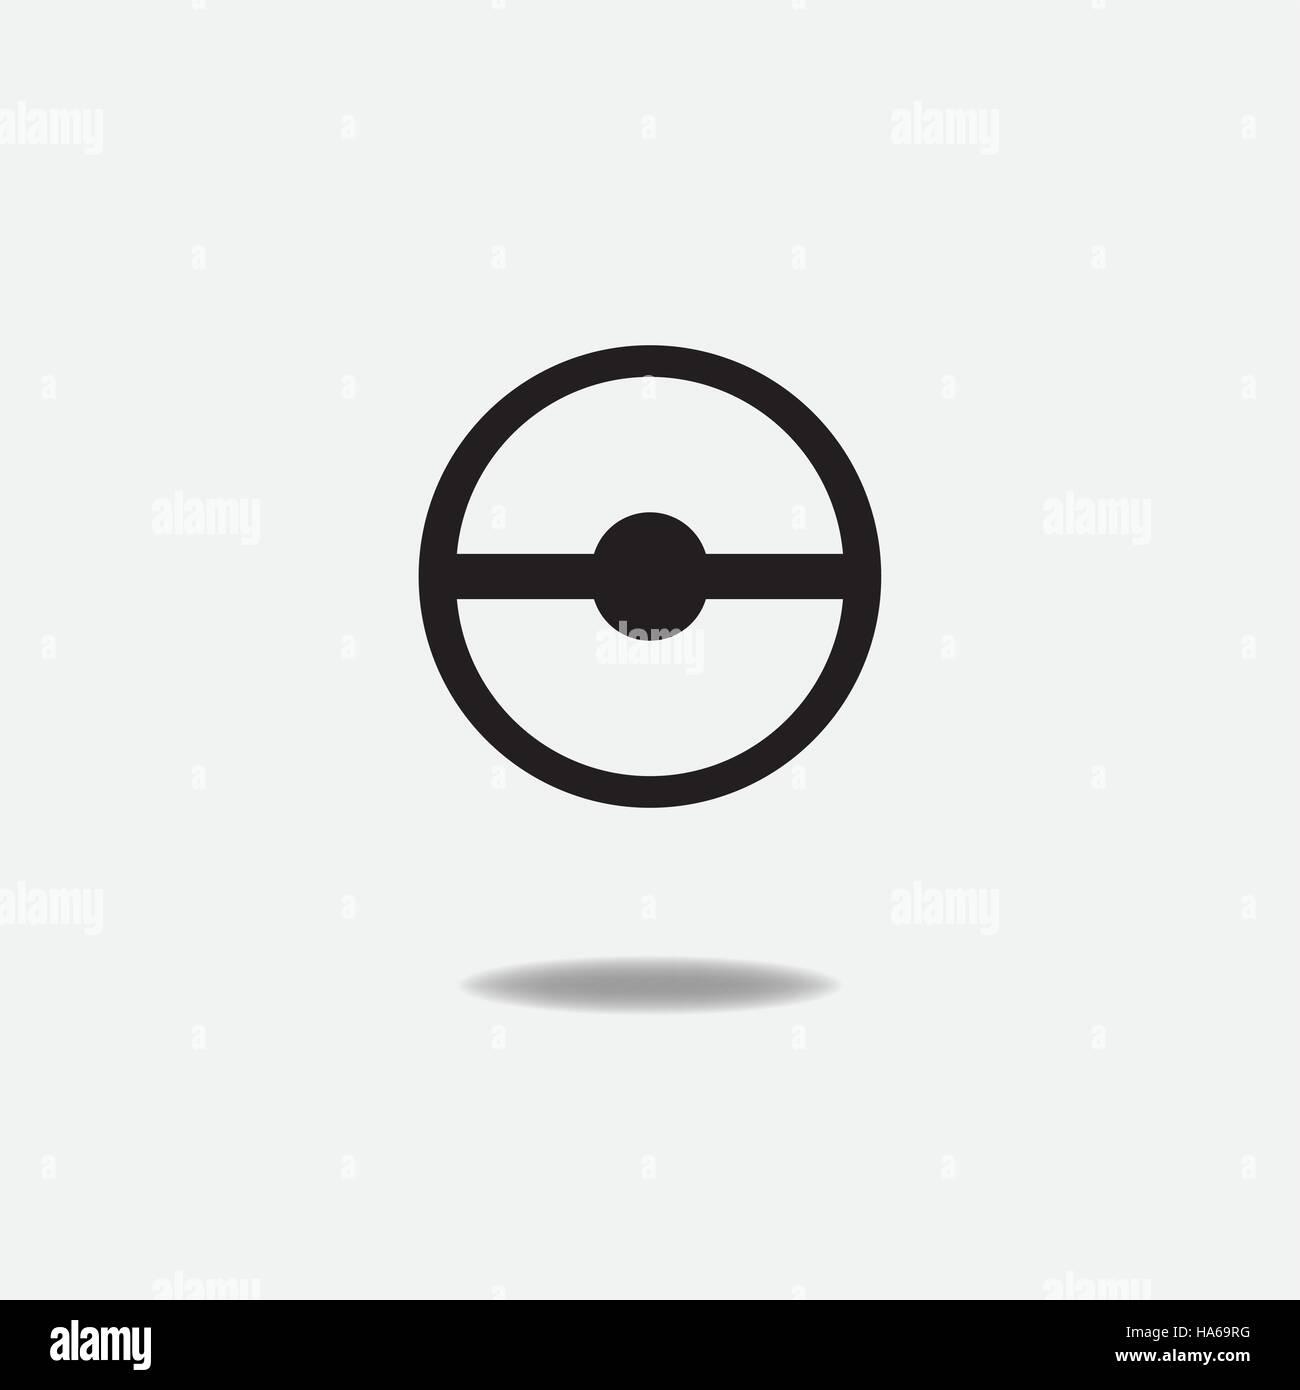 pokeball background.html